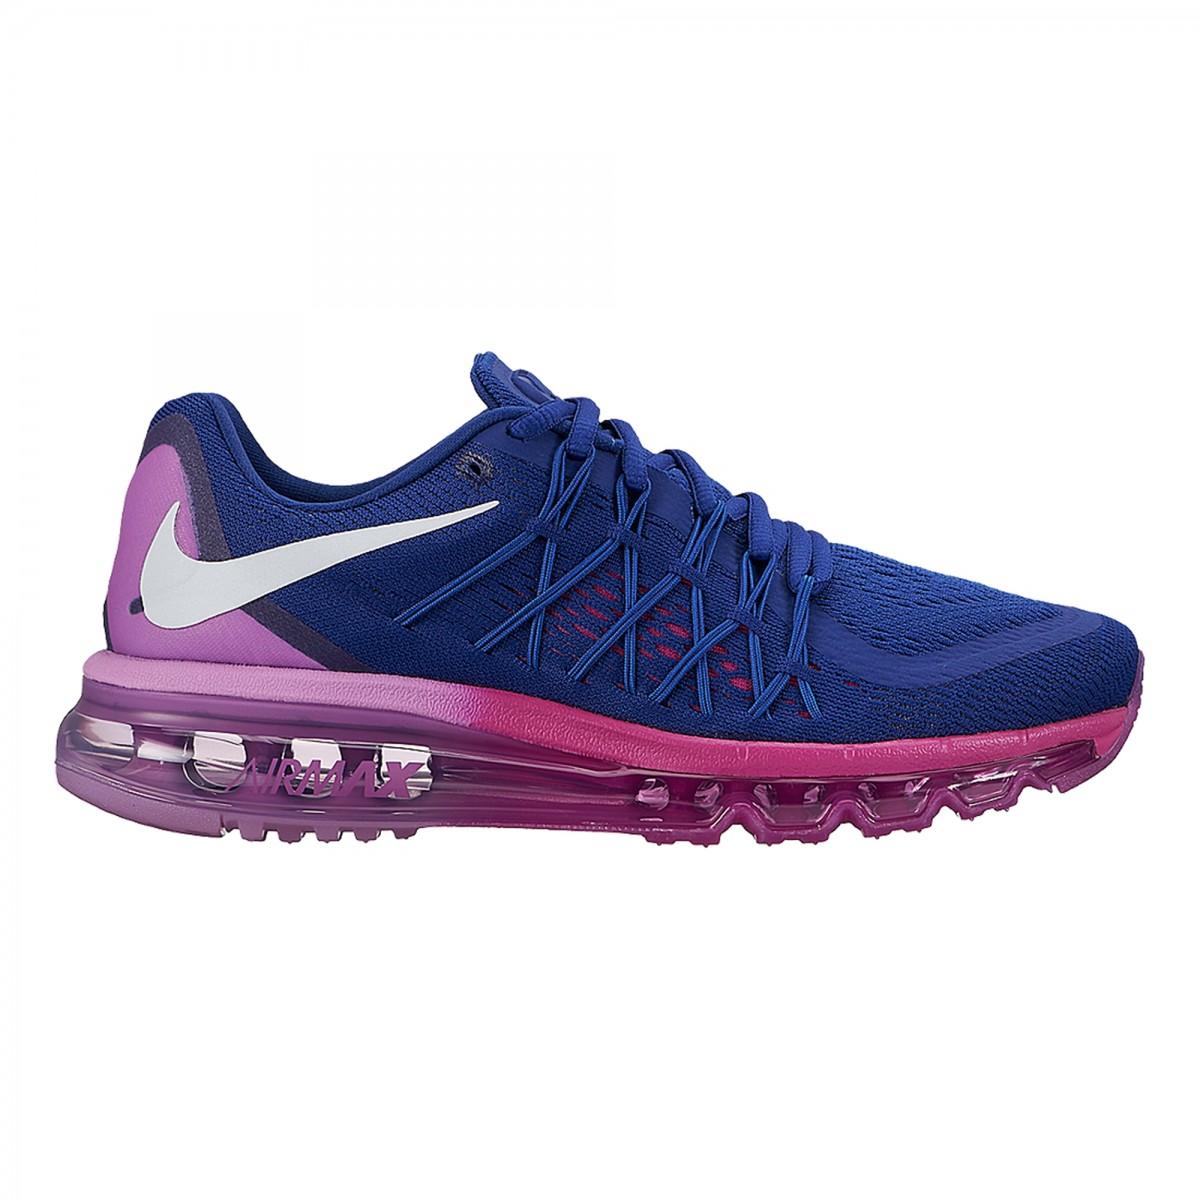 9aaf30154 Bizz Store - Tênis Feminino Nike Air Max 2015 Para Corrida